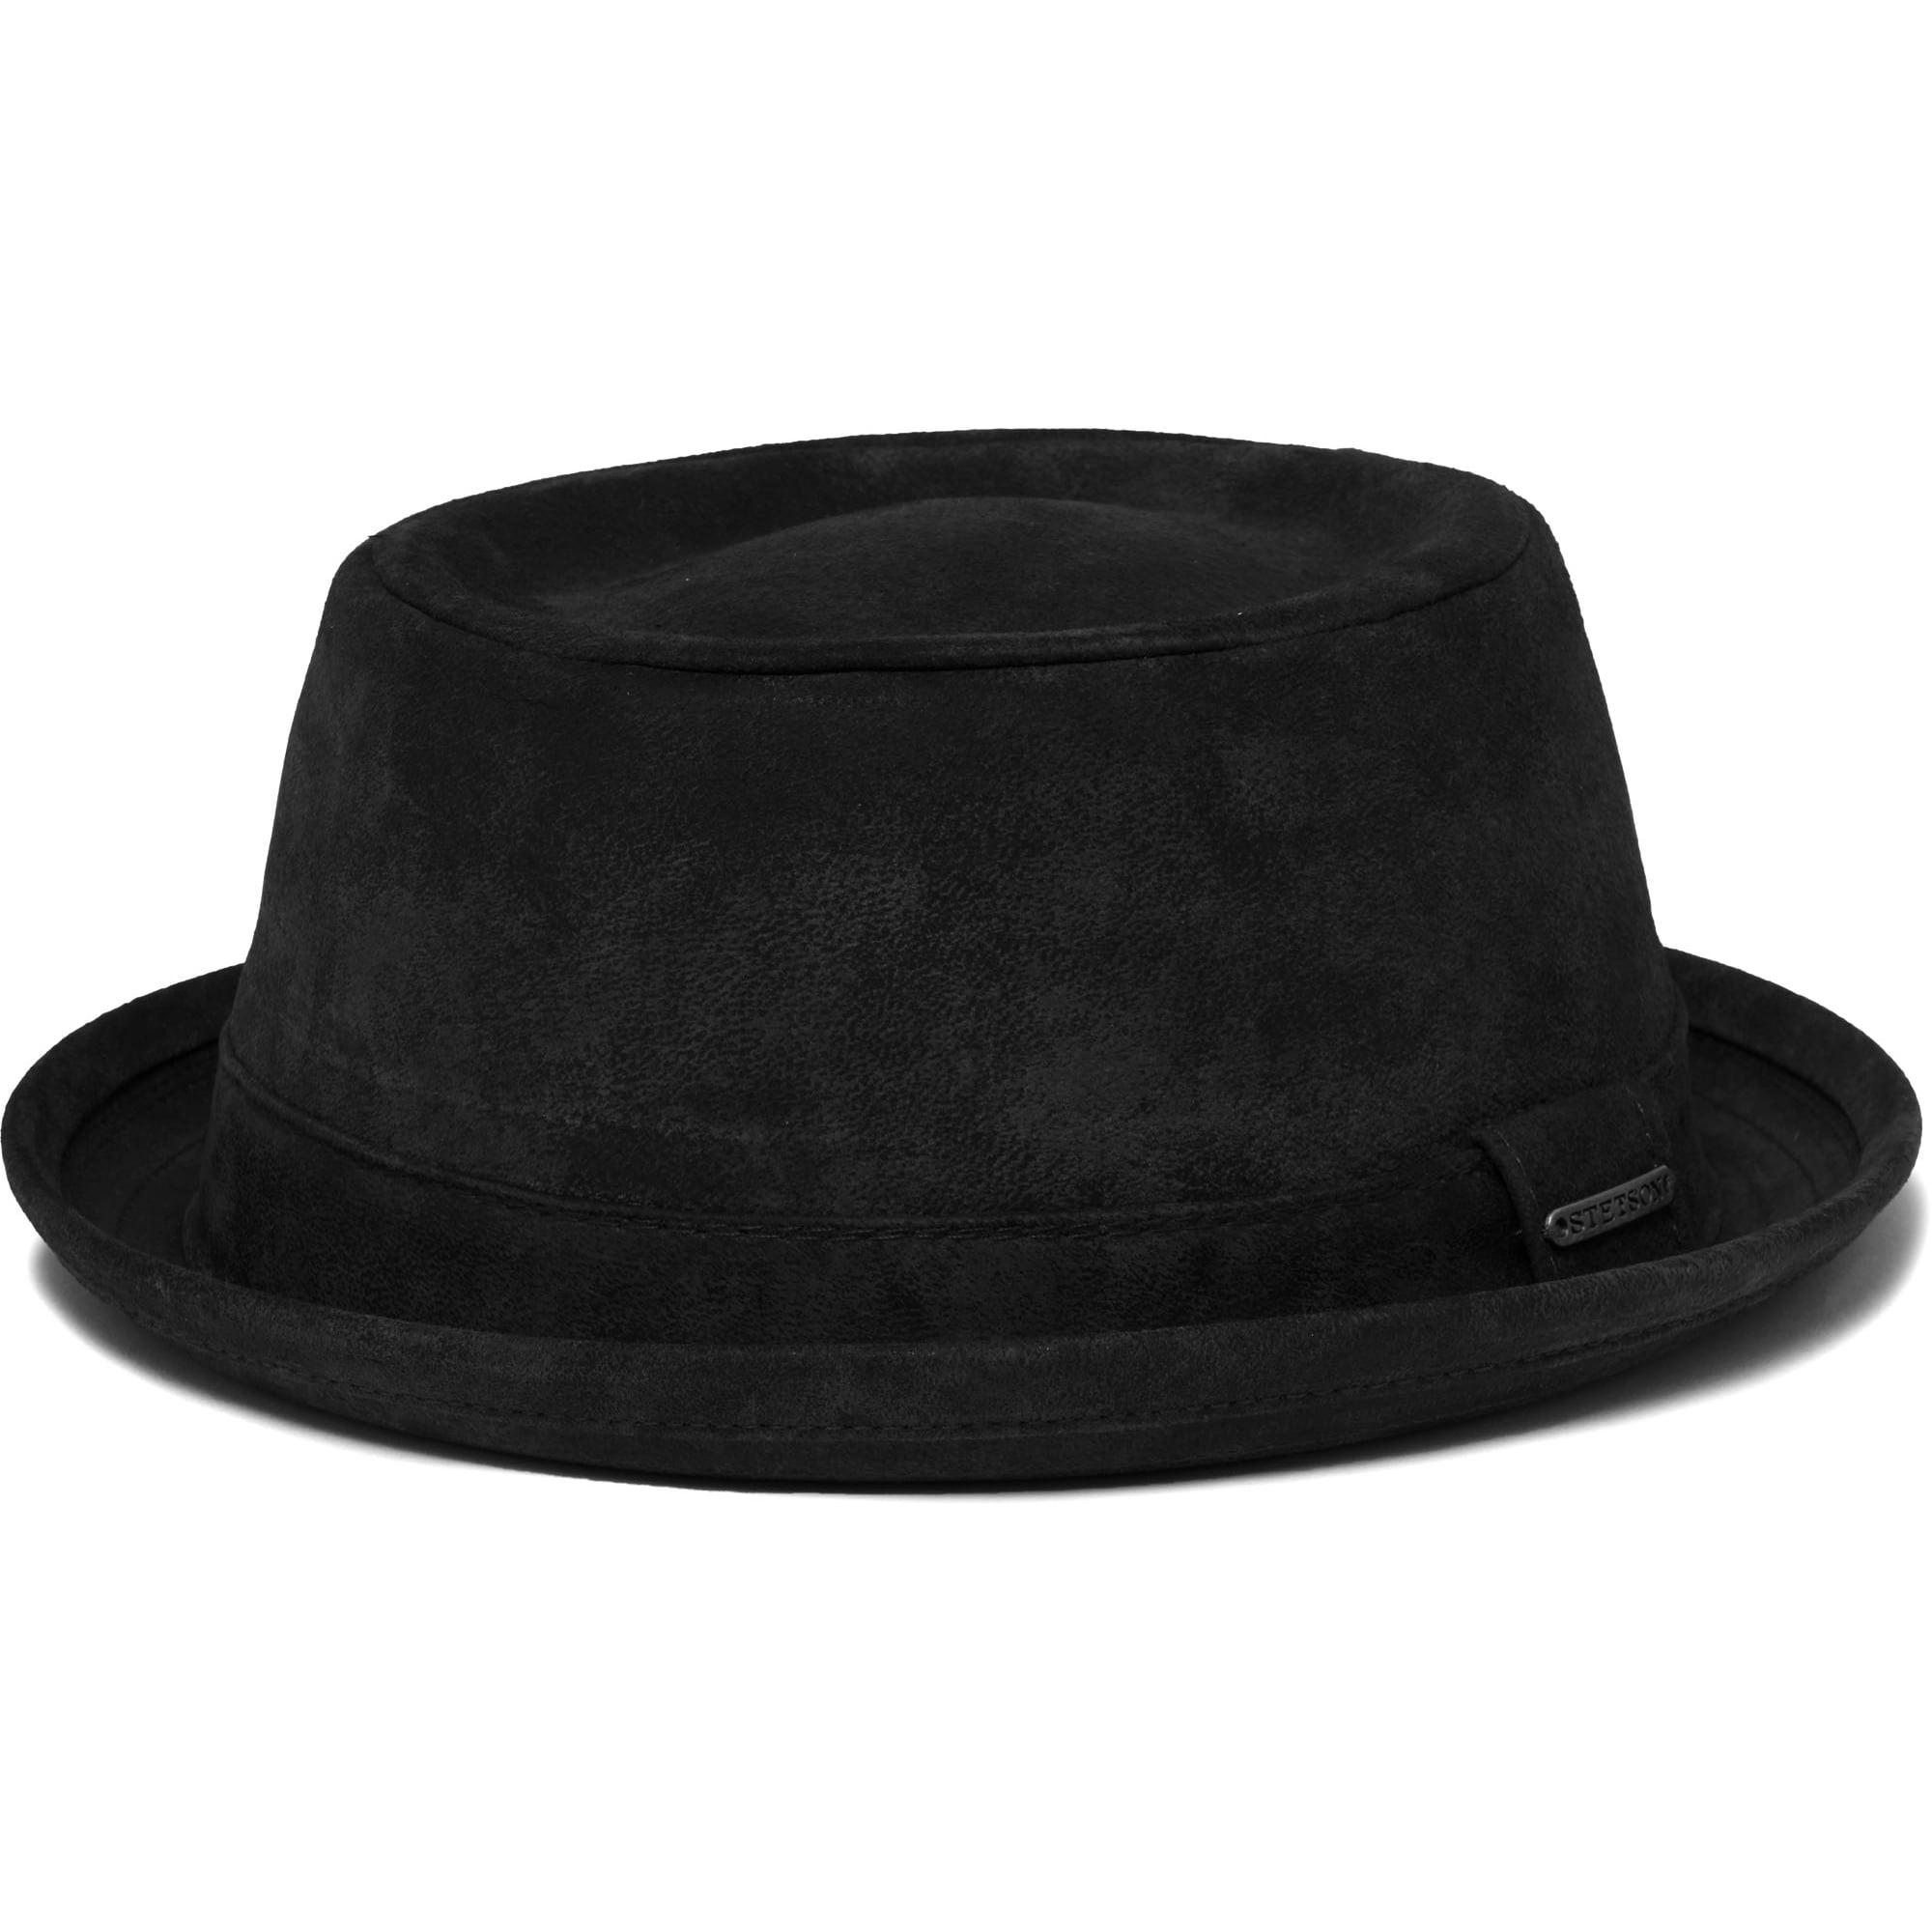 Stetson Black Odenton Pork Pie Cloth Hat 35278  24e94596203